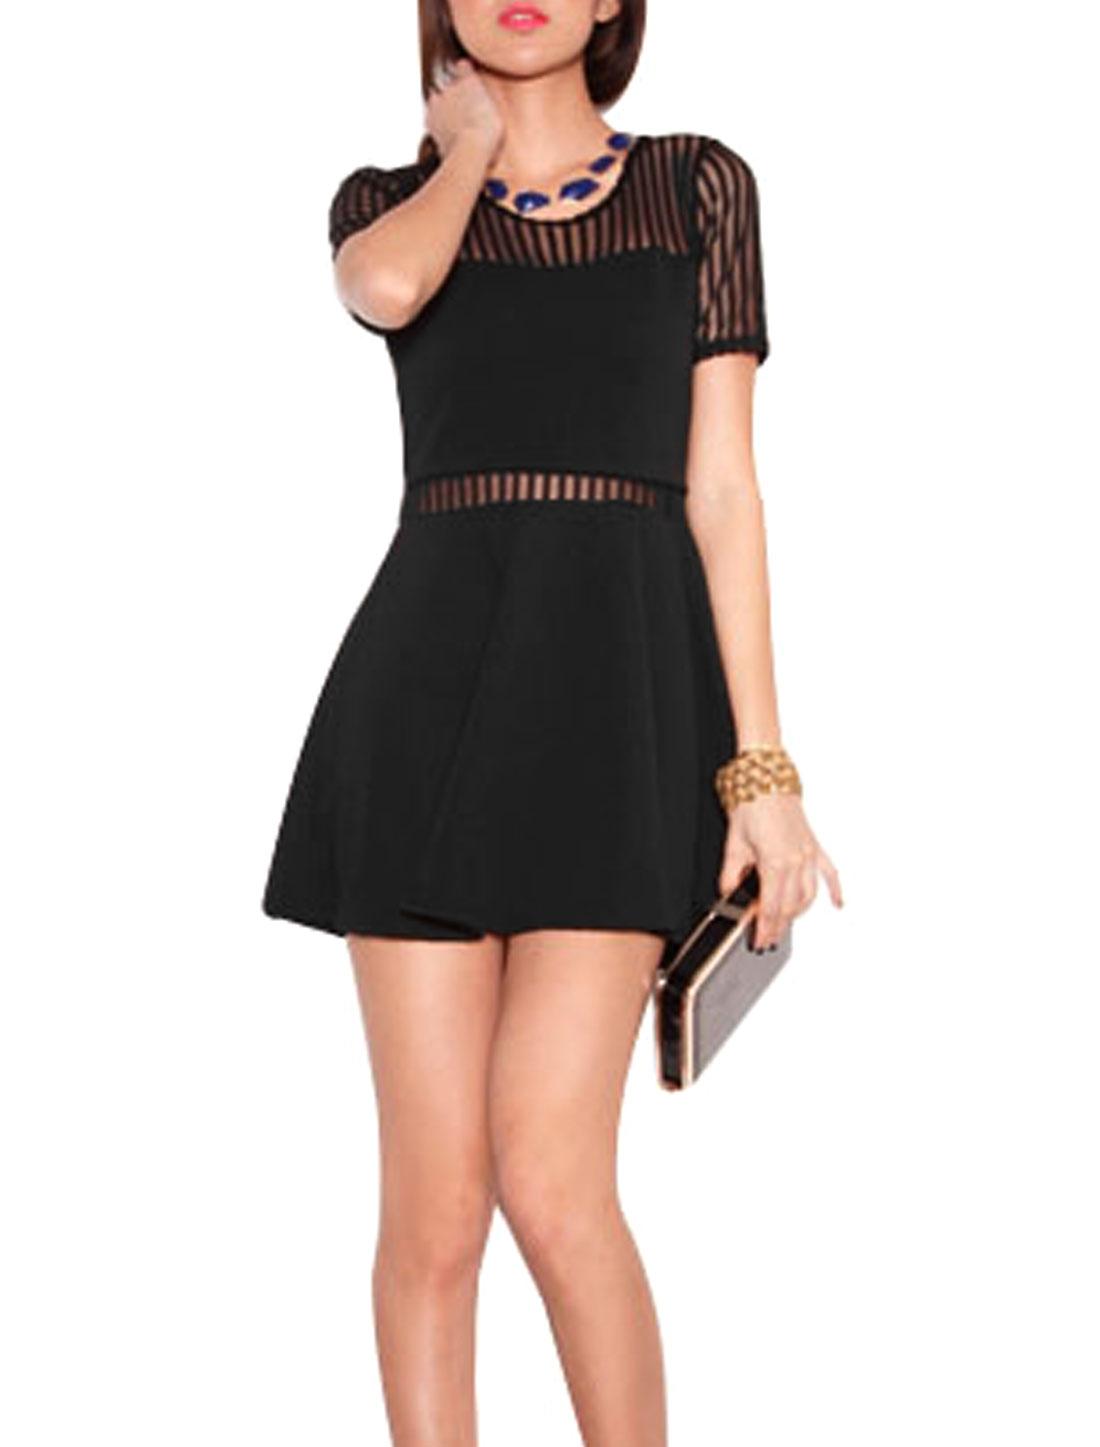 Women Organza Panel Semi Sheer Back Short Dress Black XS